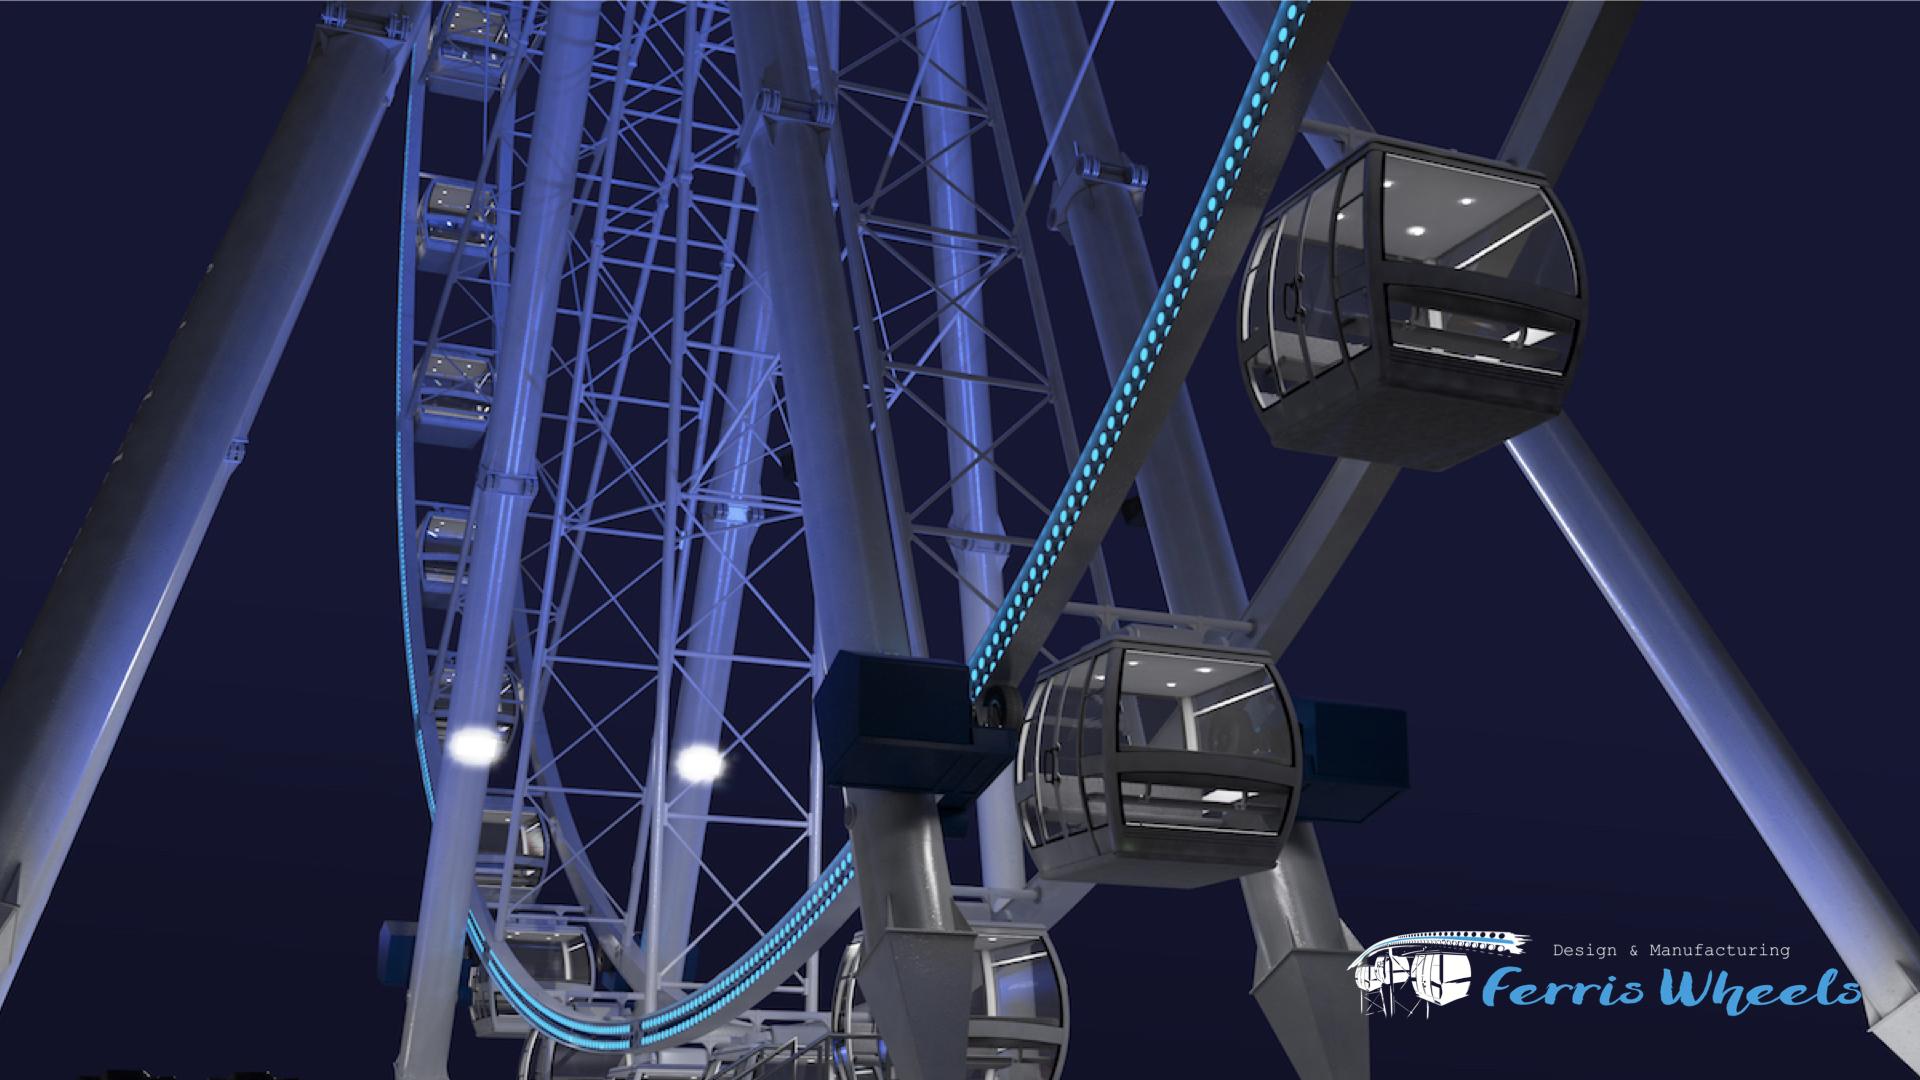 Ferris Wheels 056